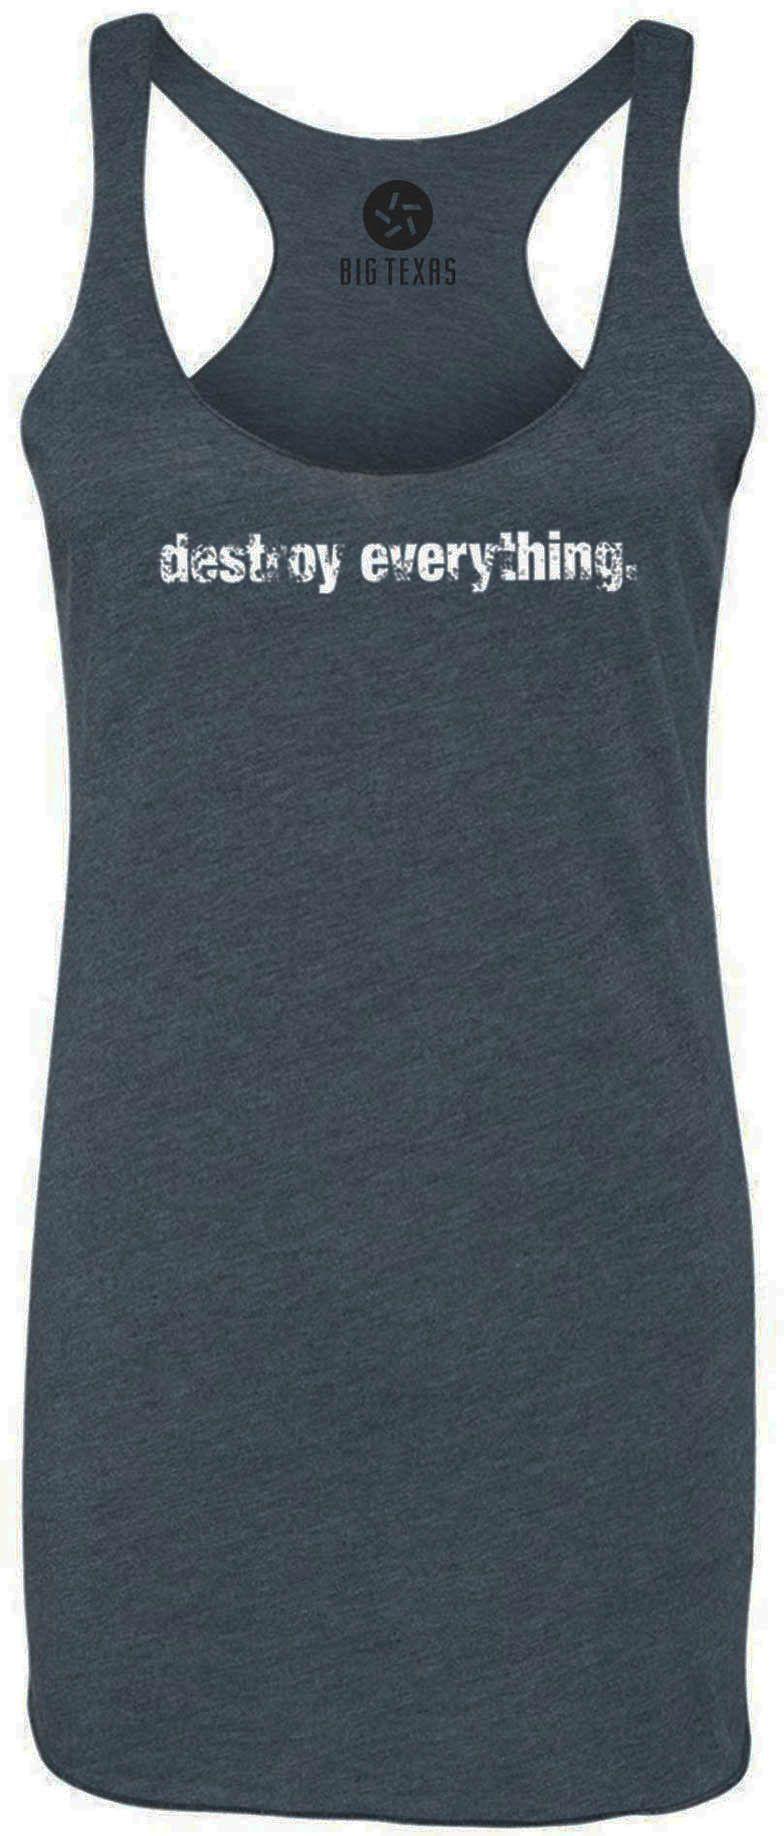 Destroy Everything (White) Tri-Blend Racerback Tank-Top